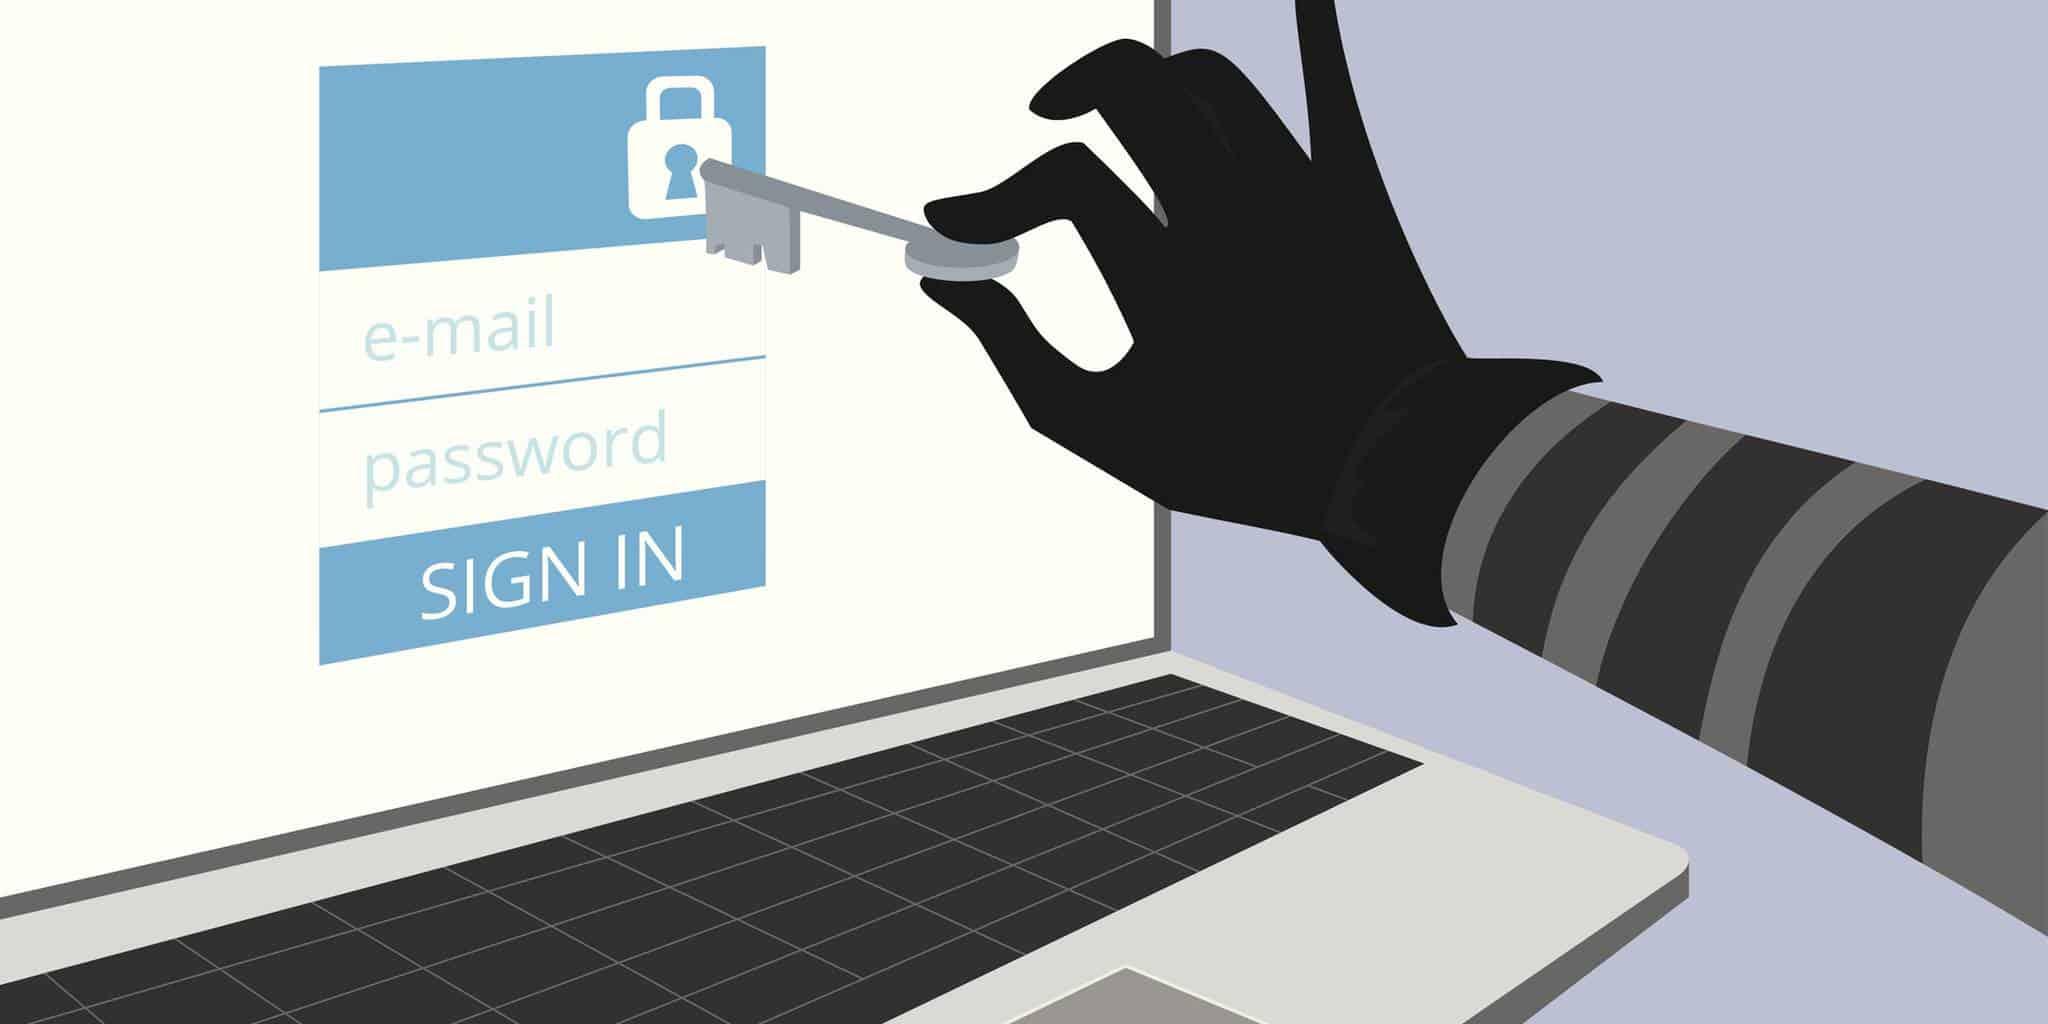 An toàn trên online